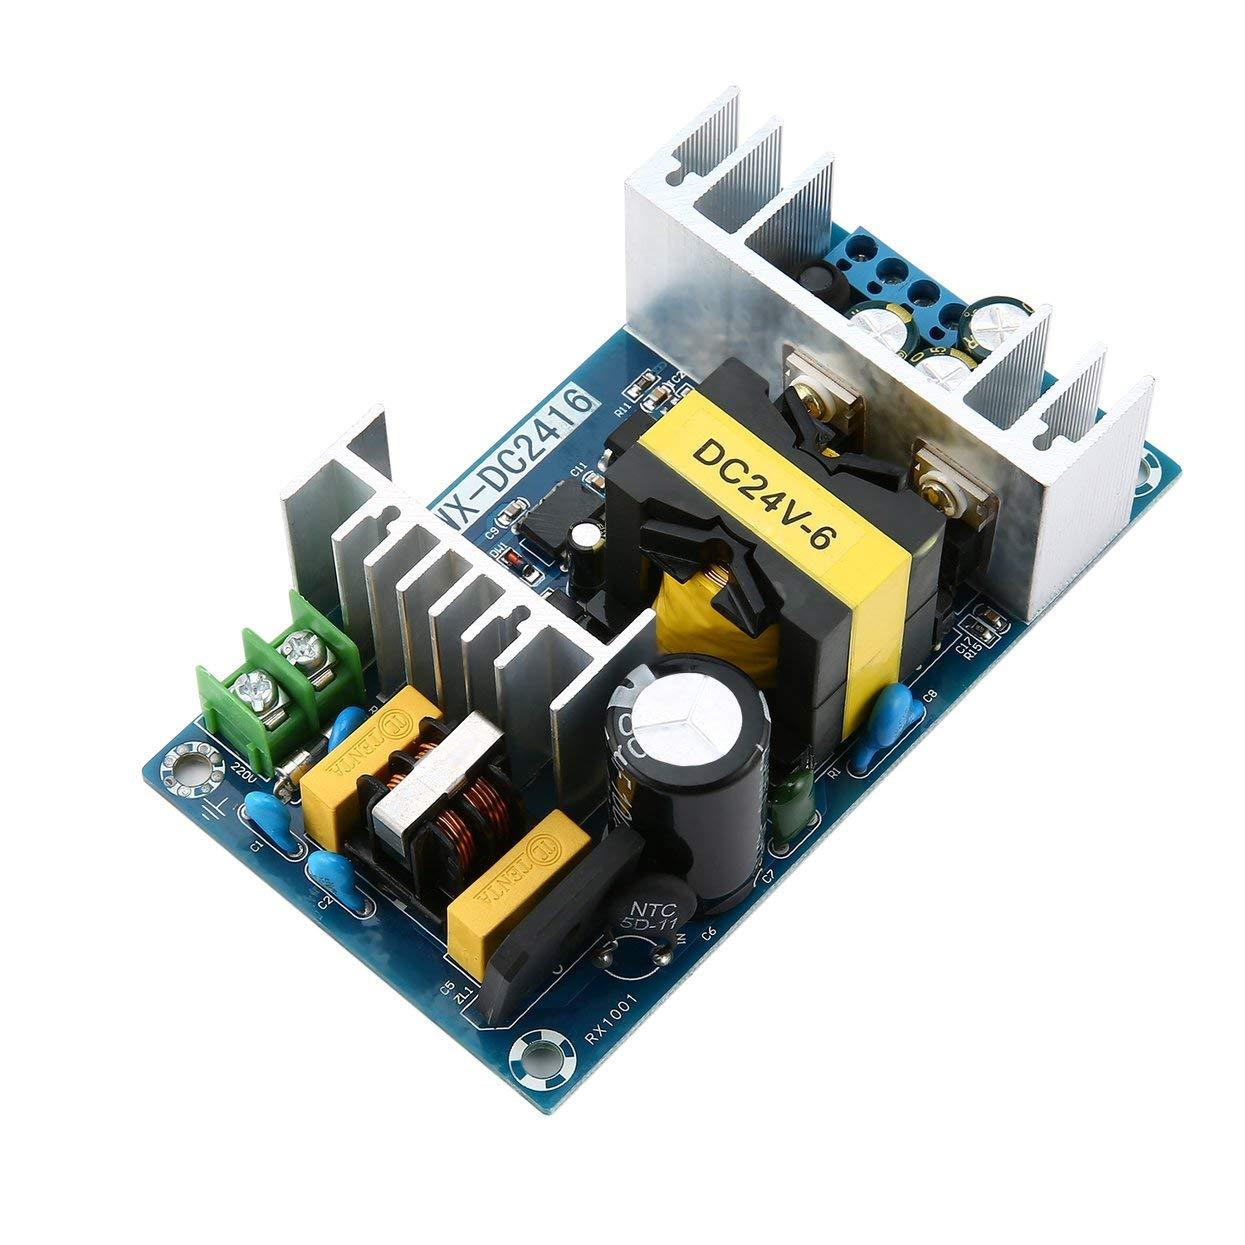 Tellaboull for Inverter AC-DC 24 V 6A 150 W Alimentatore Switching Modulo di Alimentazione Modulo di Alimentazione ad Alta Tensione Modulo di Alimentazione CC